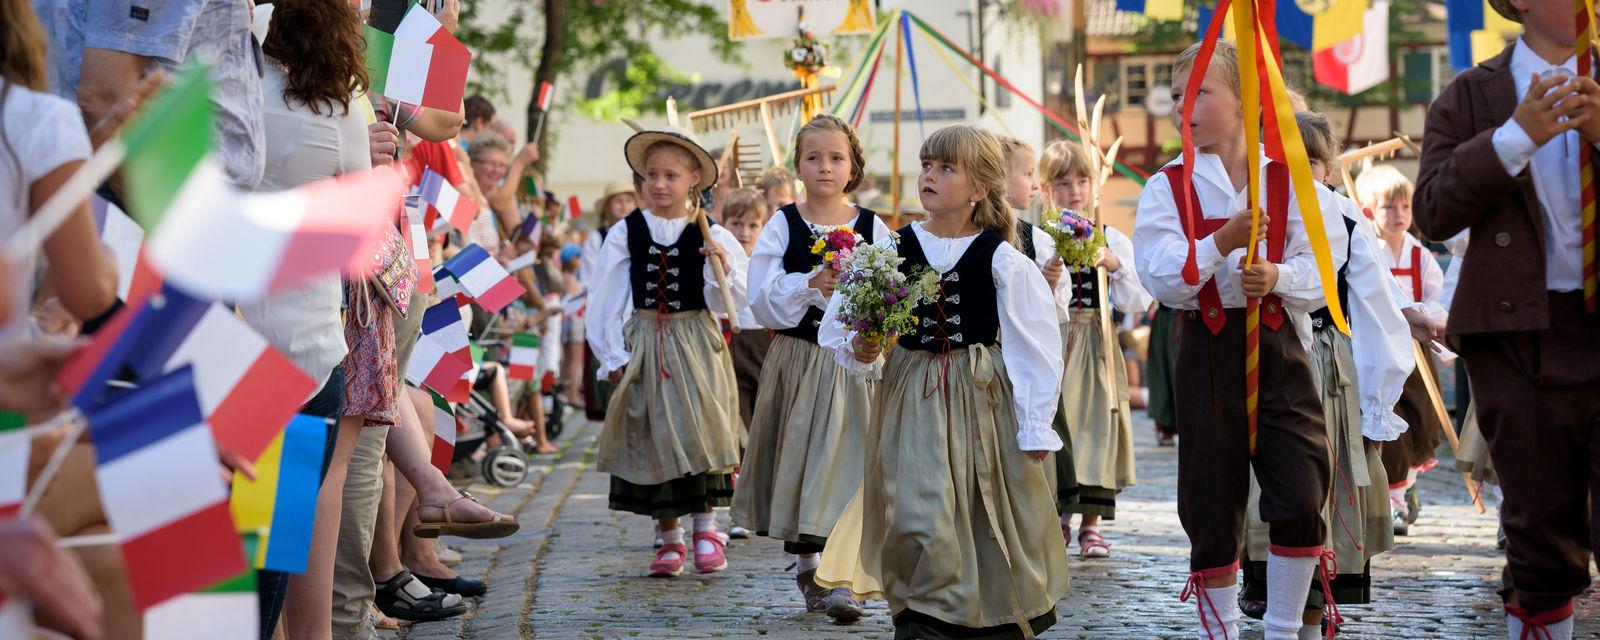 Kinderfest-Umzug - der Höhepunkt des Kinderfestes.